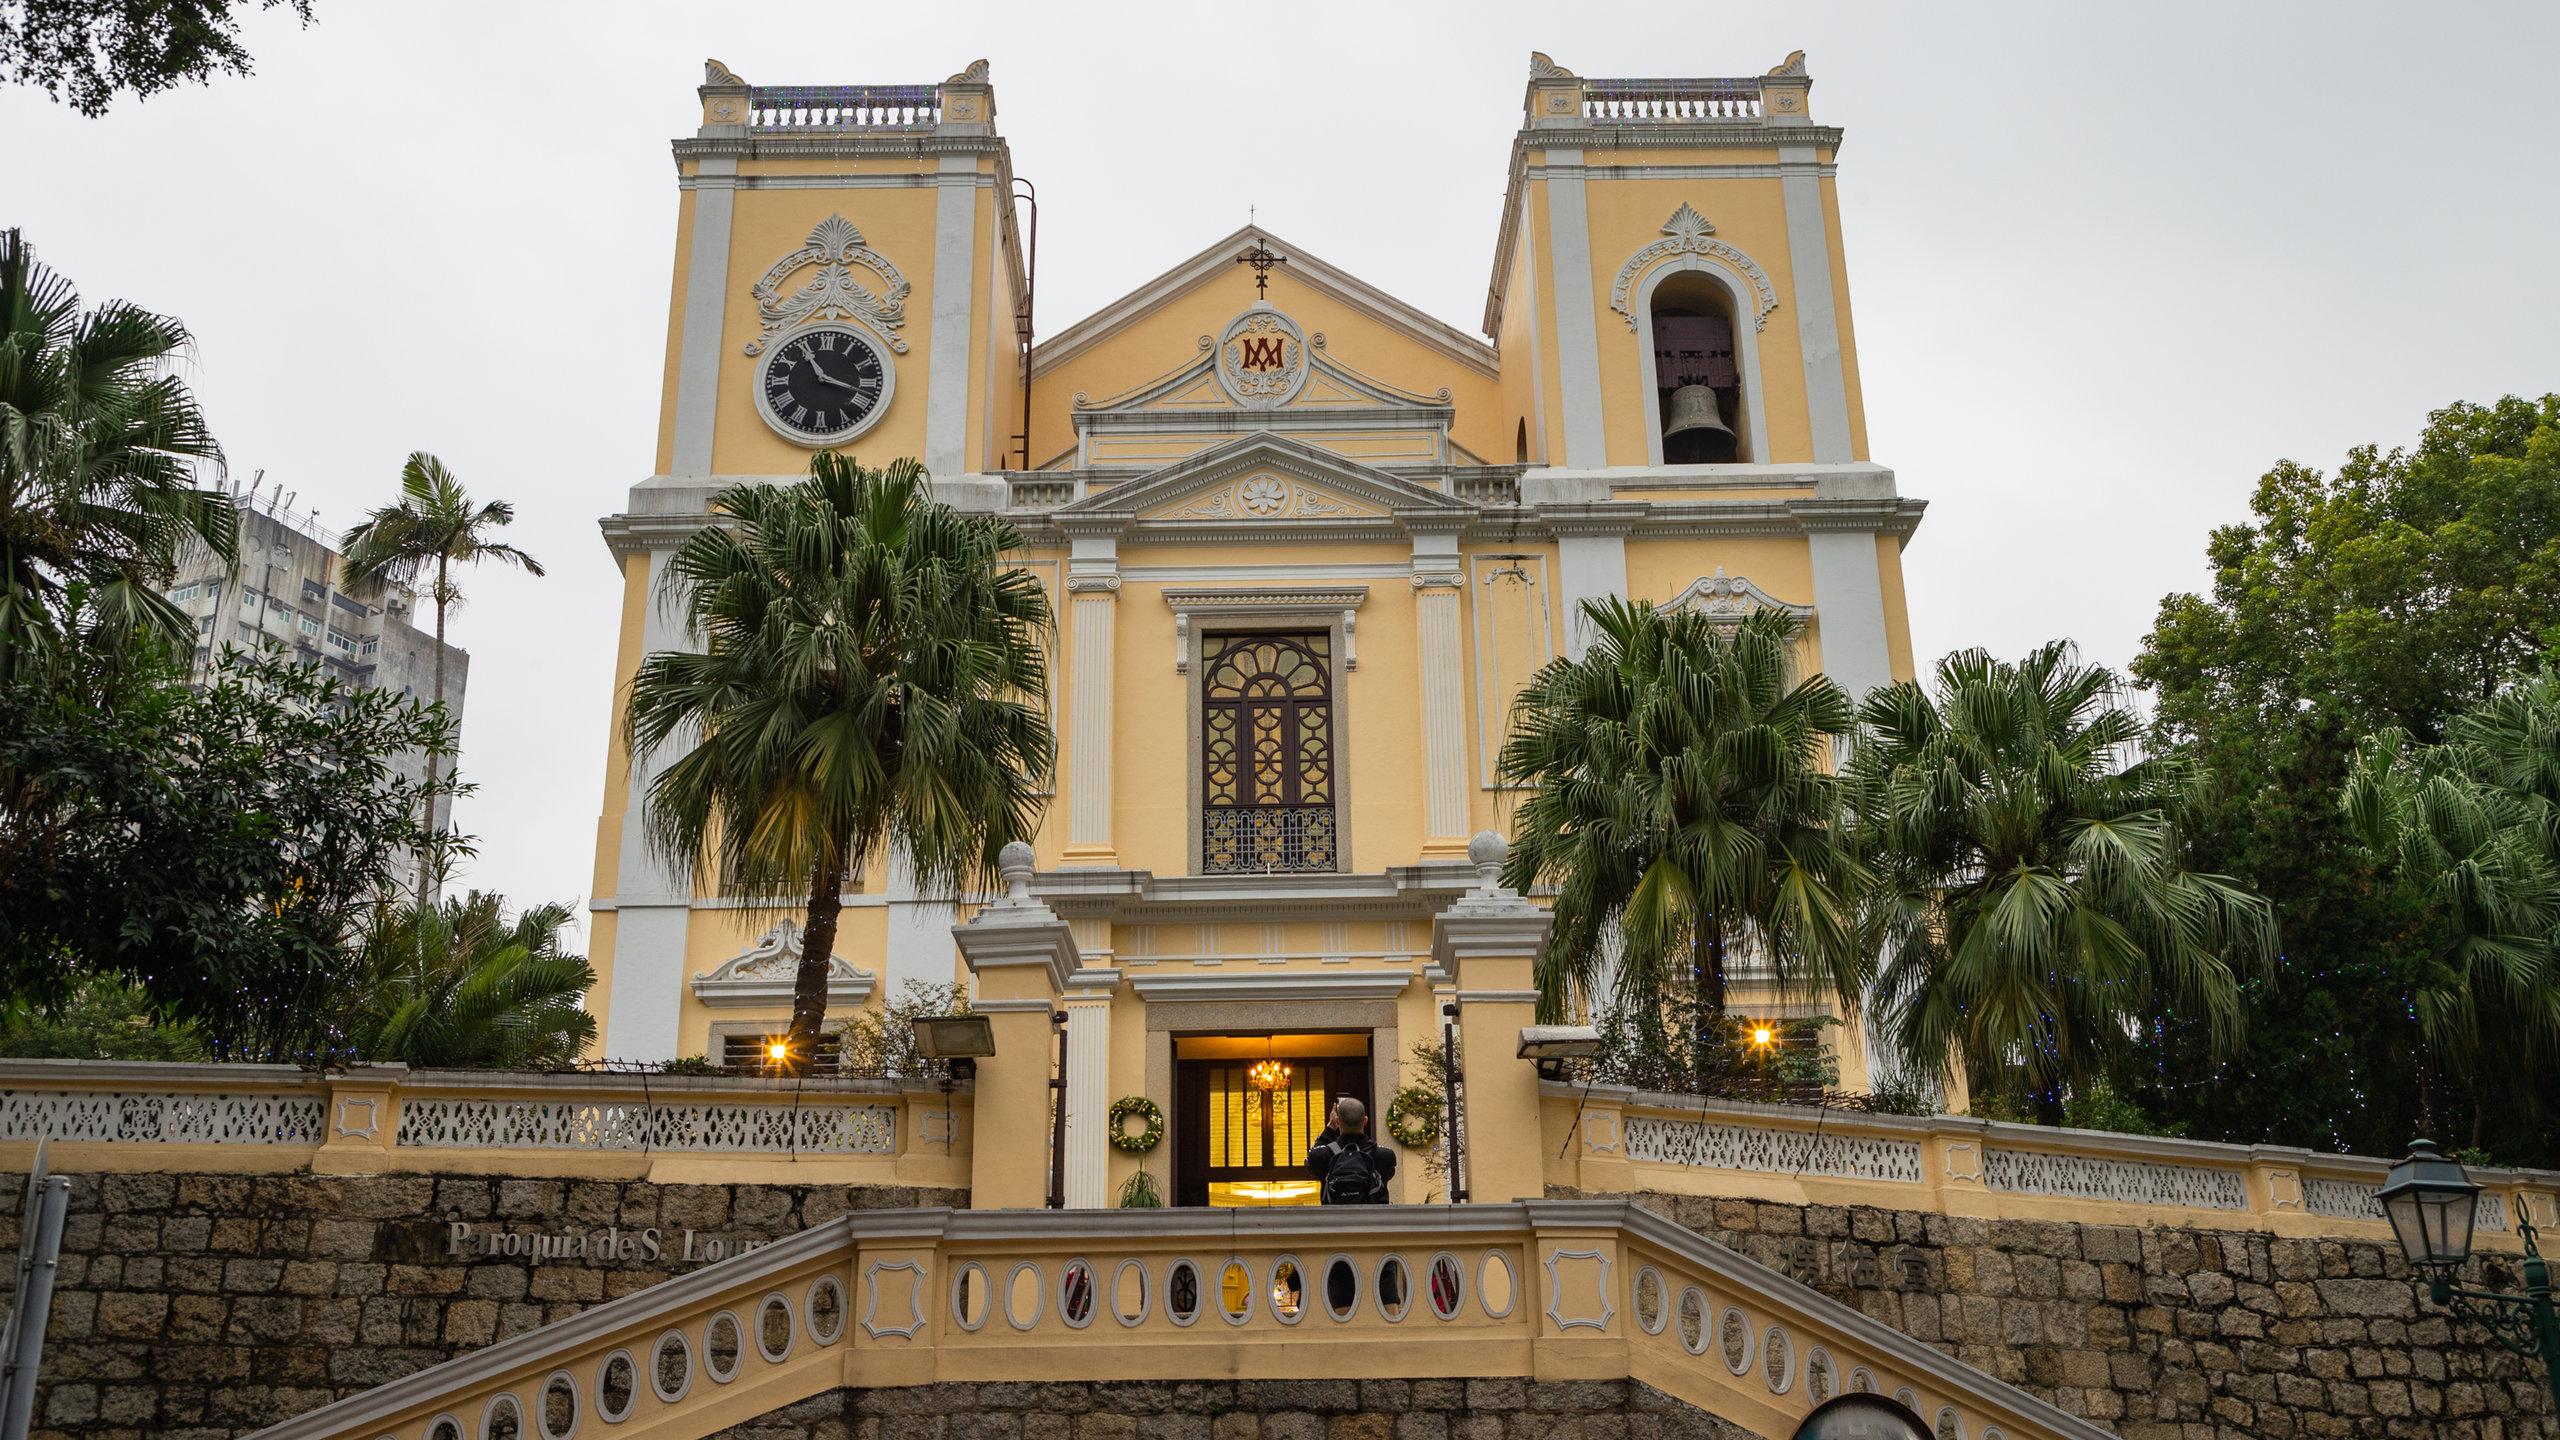 Cari tahu sejarah dari Pusat Sejarah Macau dengan mampir ke Gereja St. Lawrence. Jelajahi pilihan hiburan dan kasino di area kaya budaya ini.